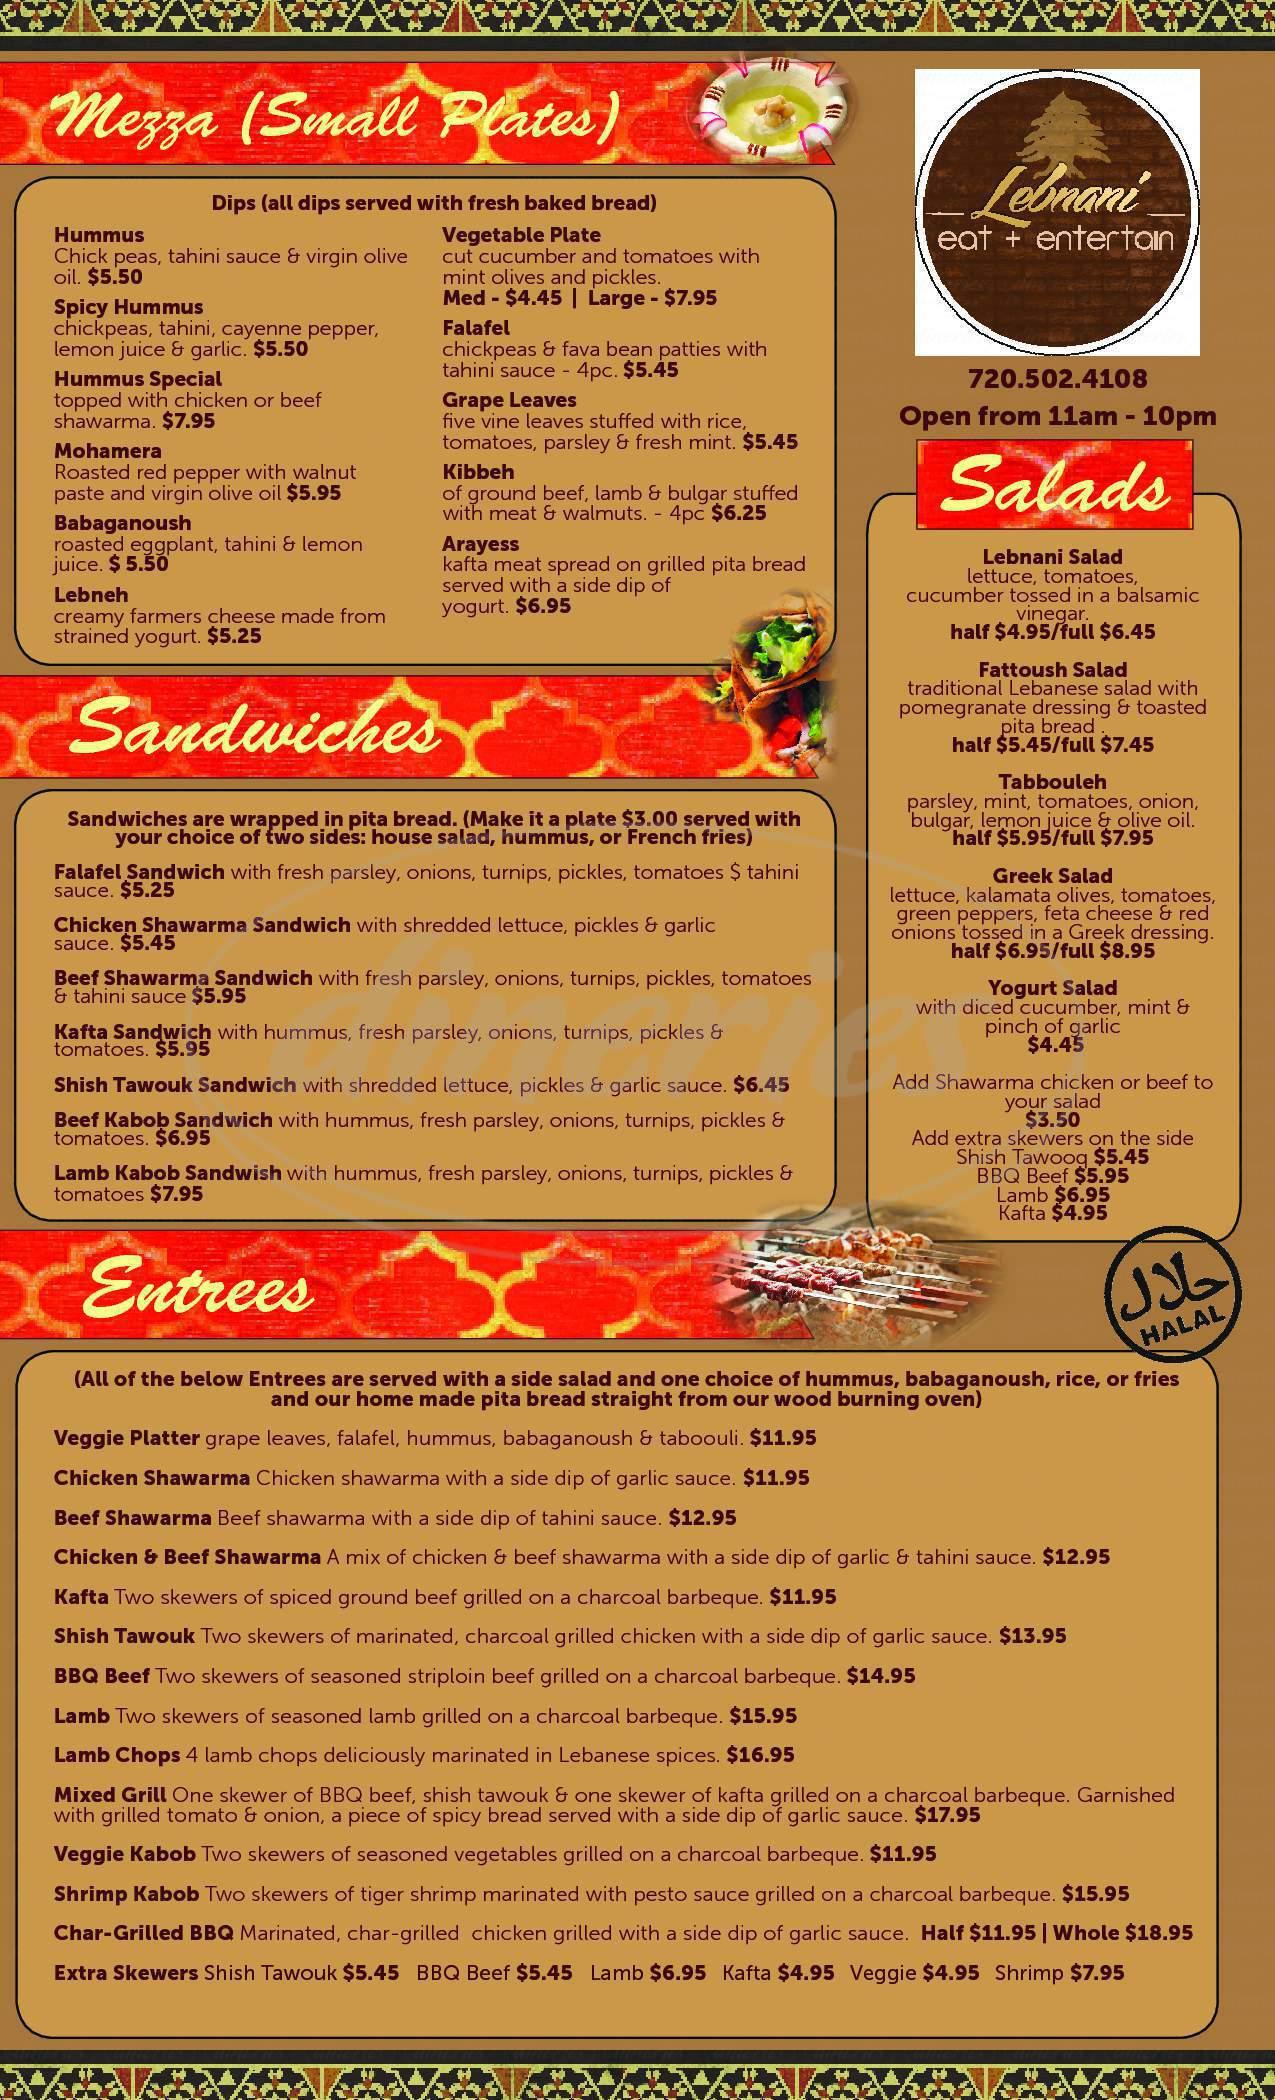 menu for Lebnani